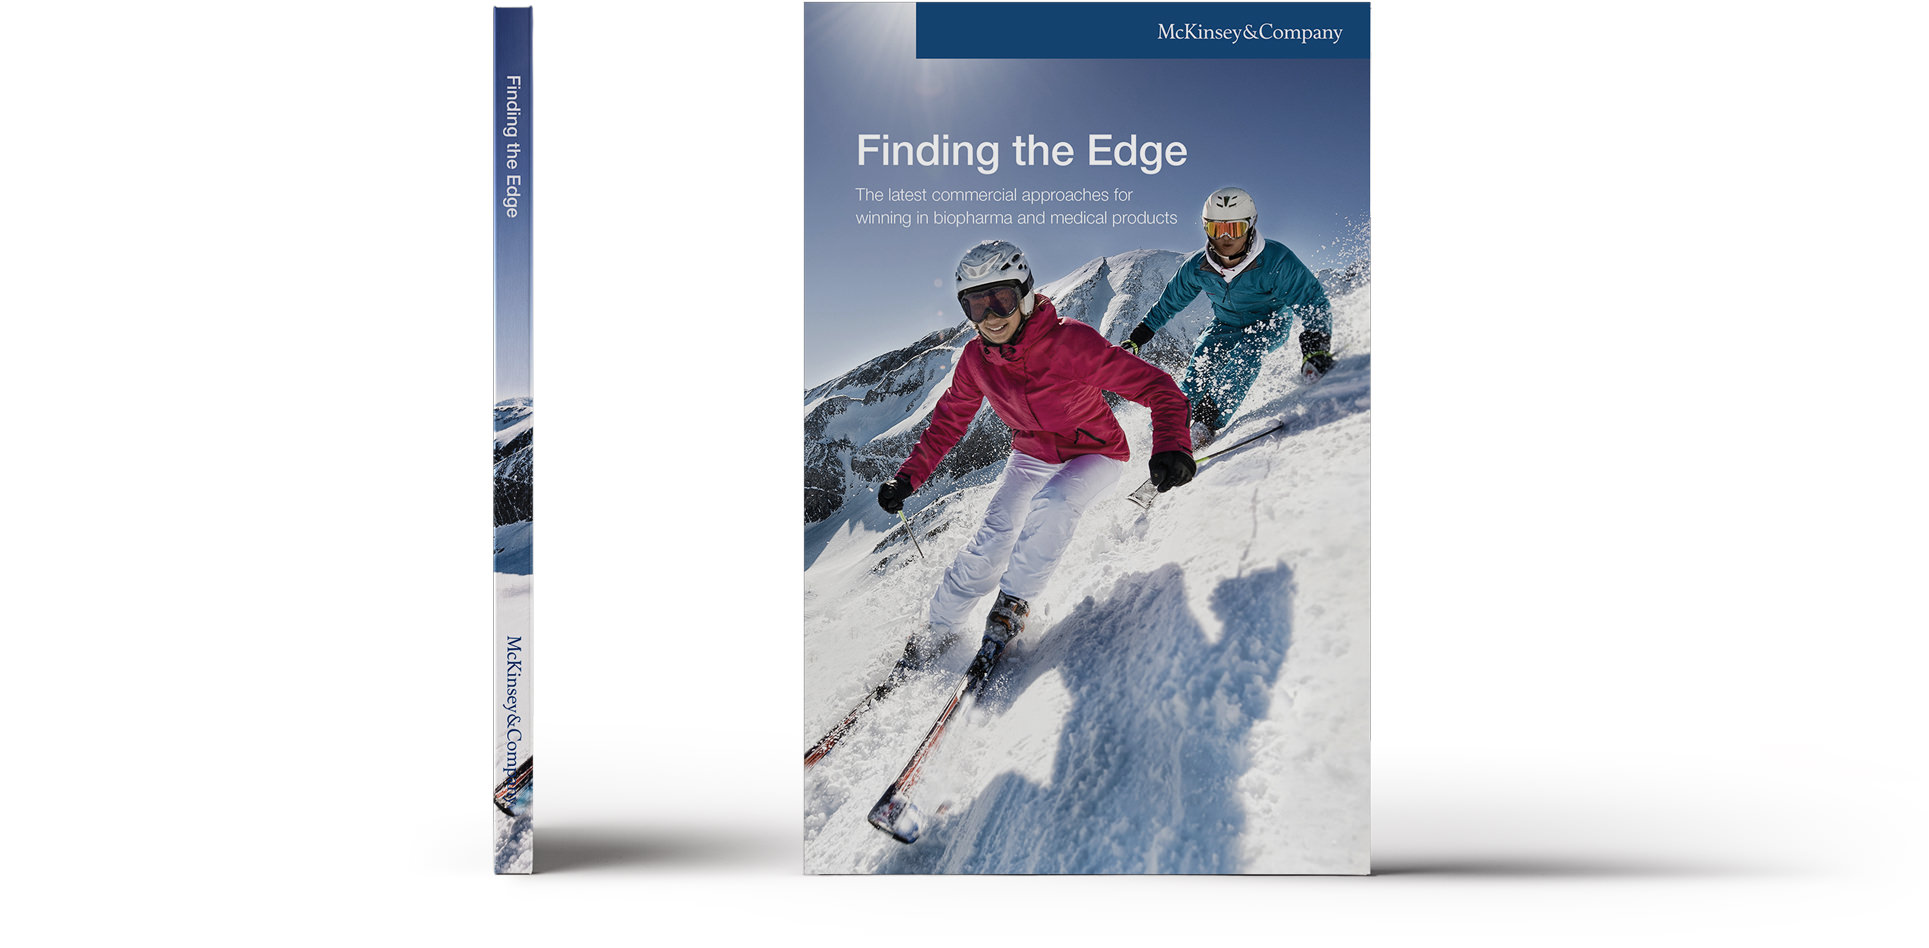 mckinsey-book-cover.jpg